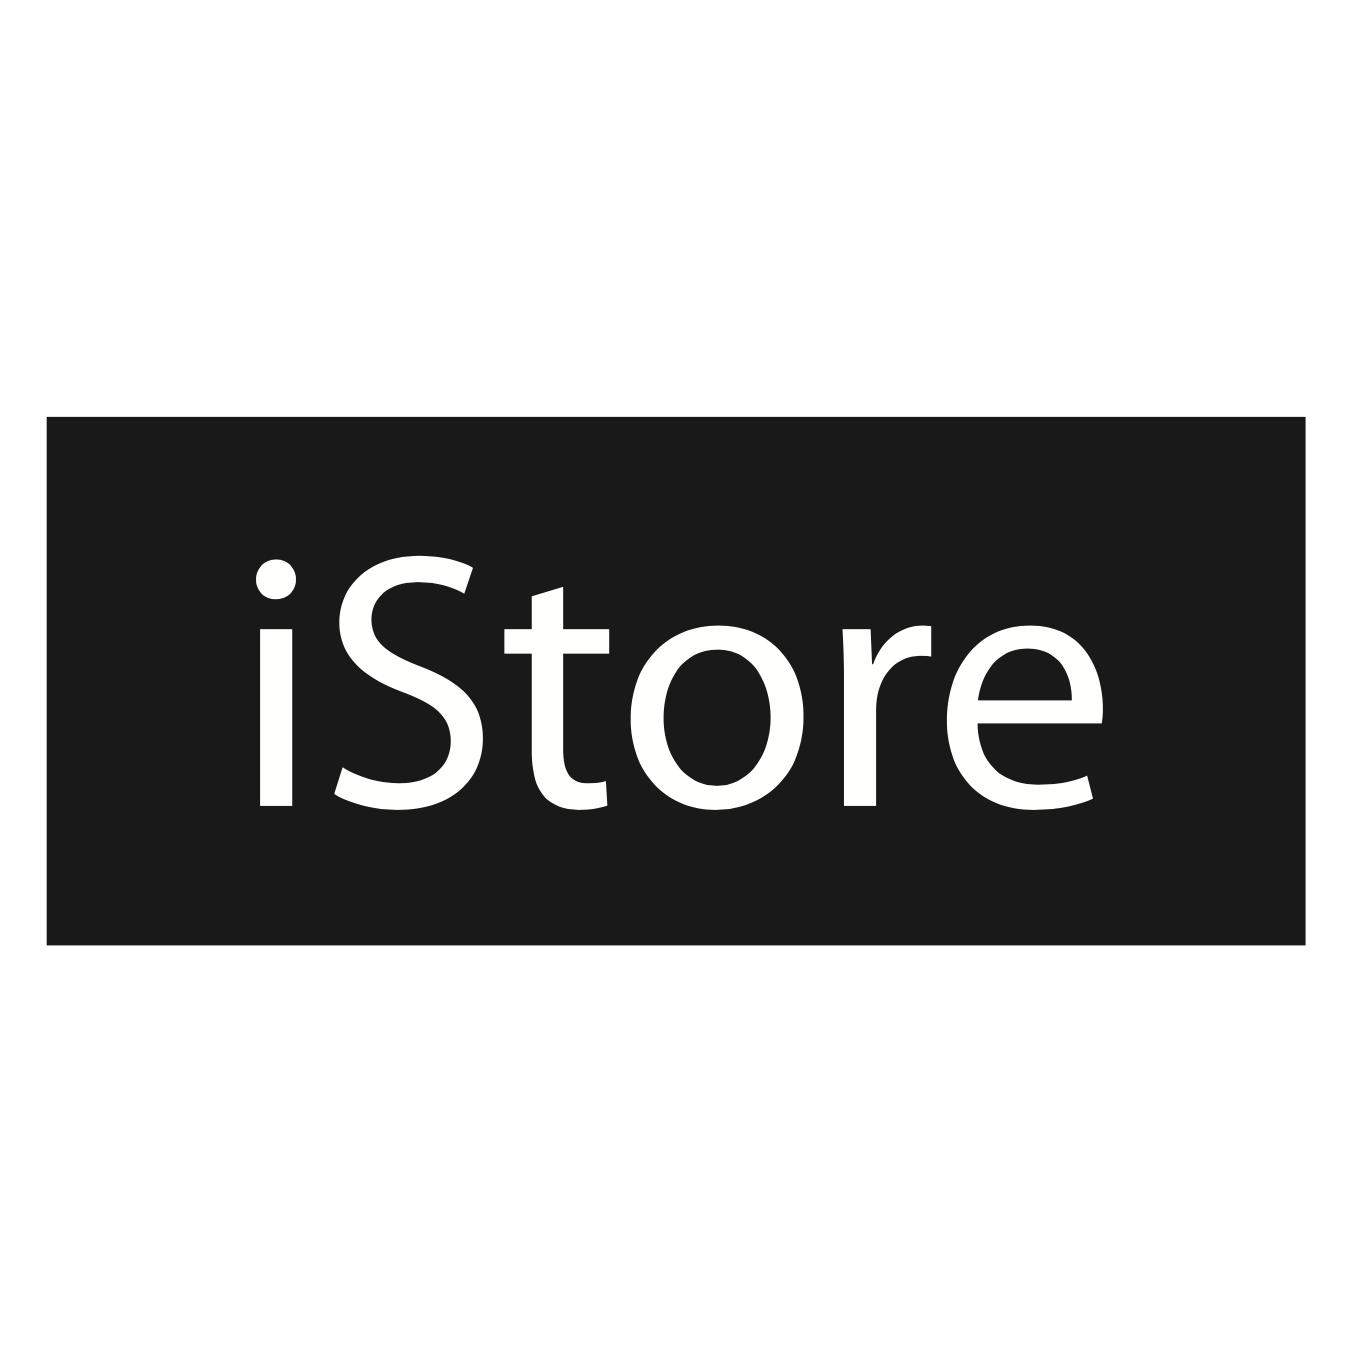 iPhone 6 Plus 16GB - Silver